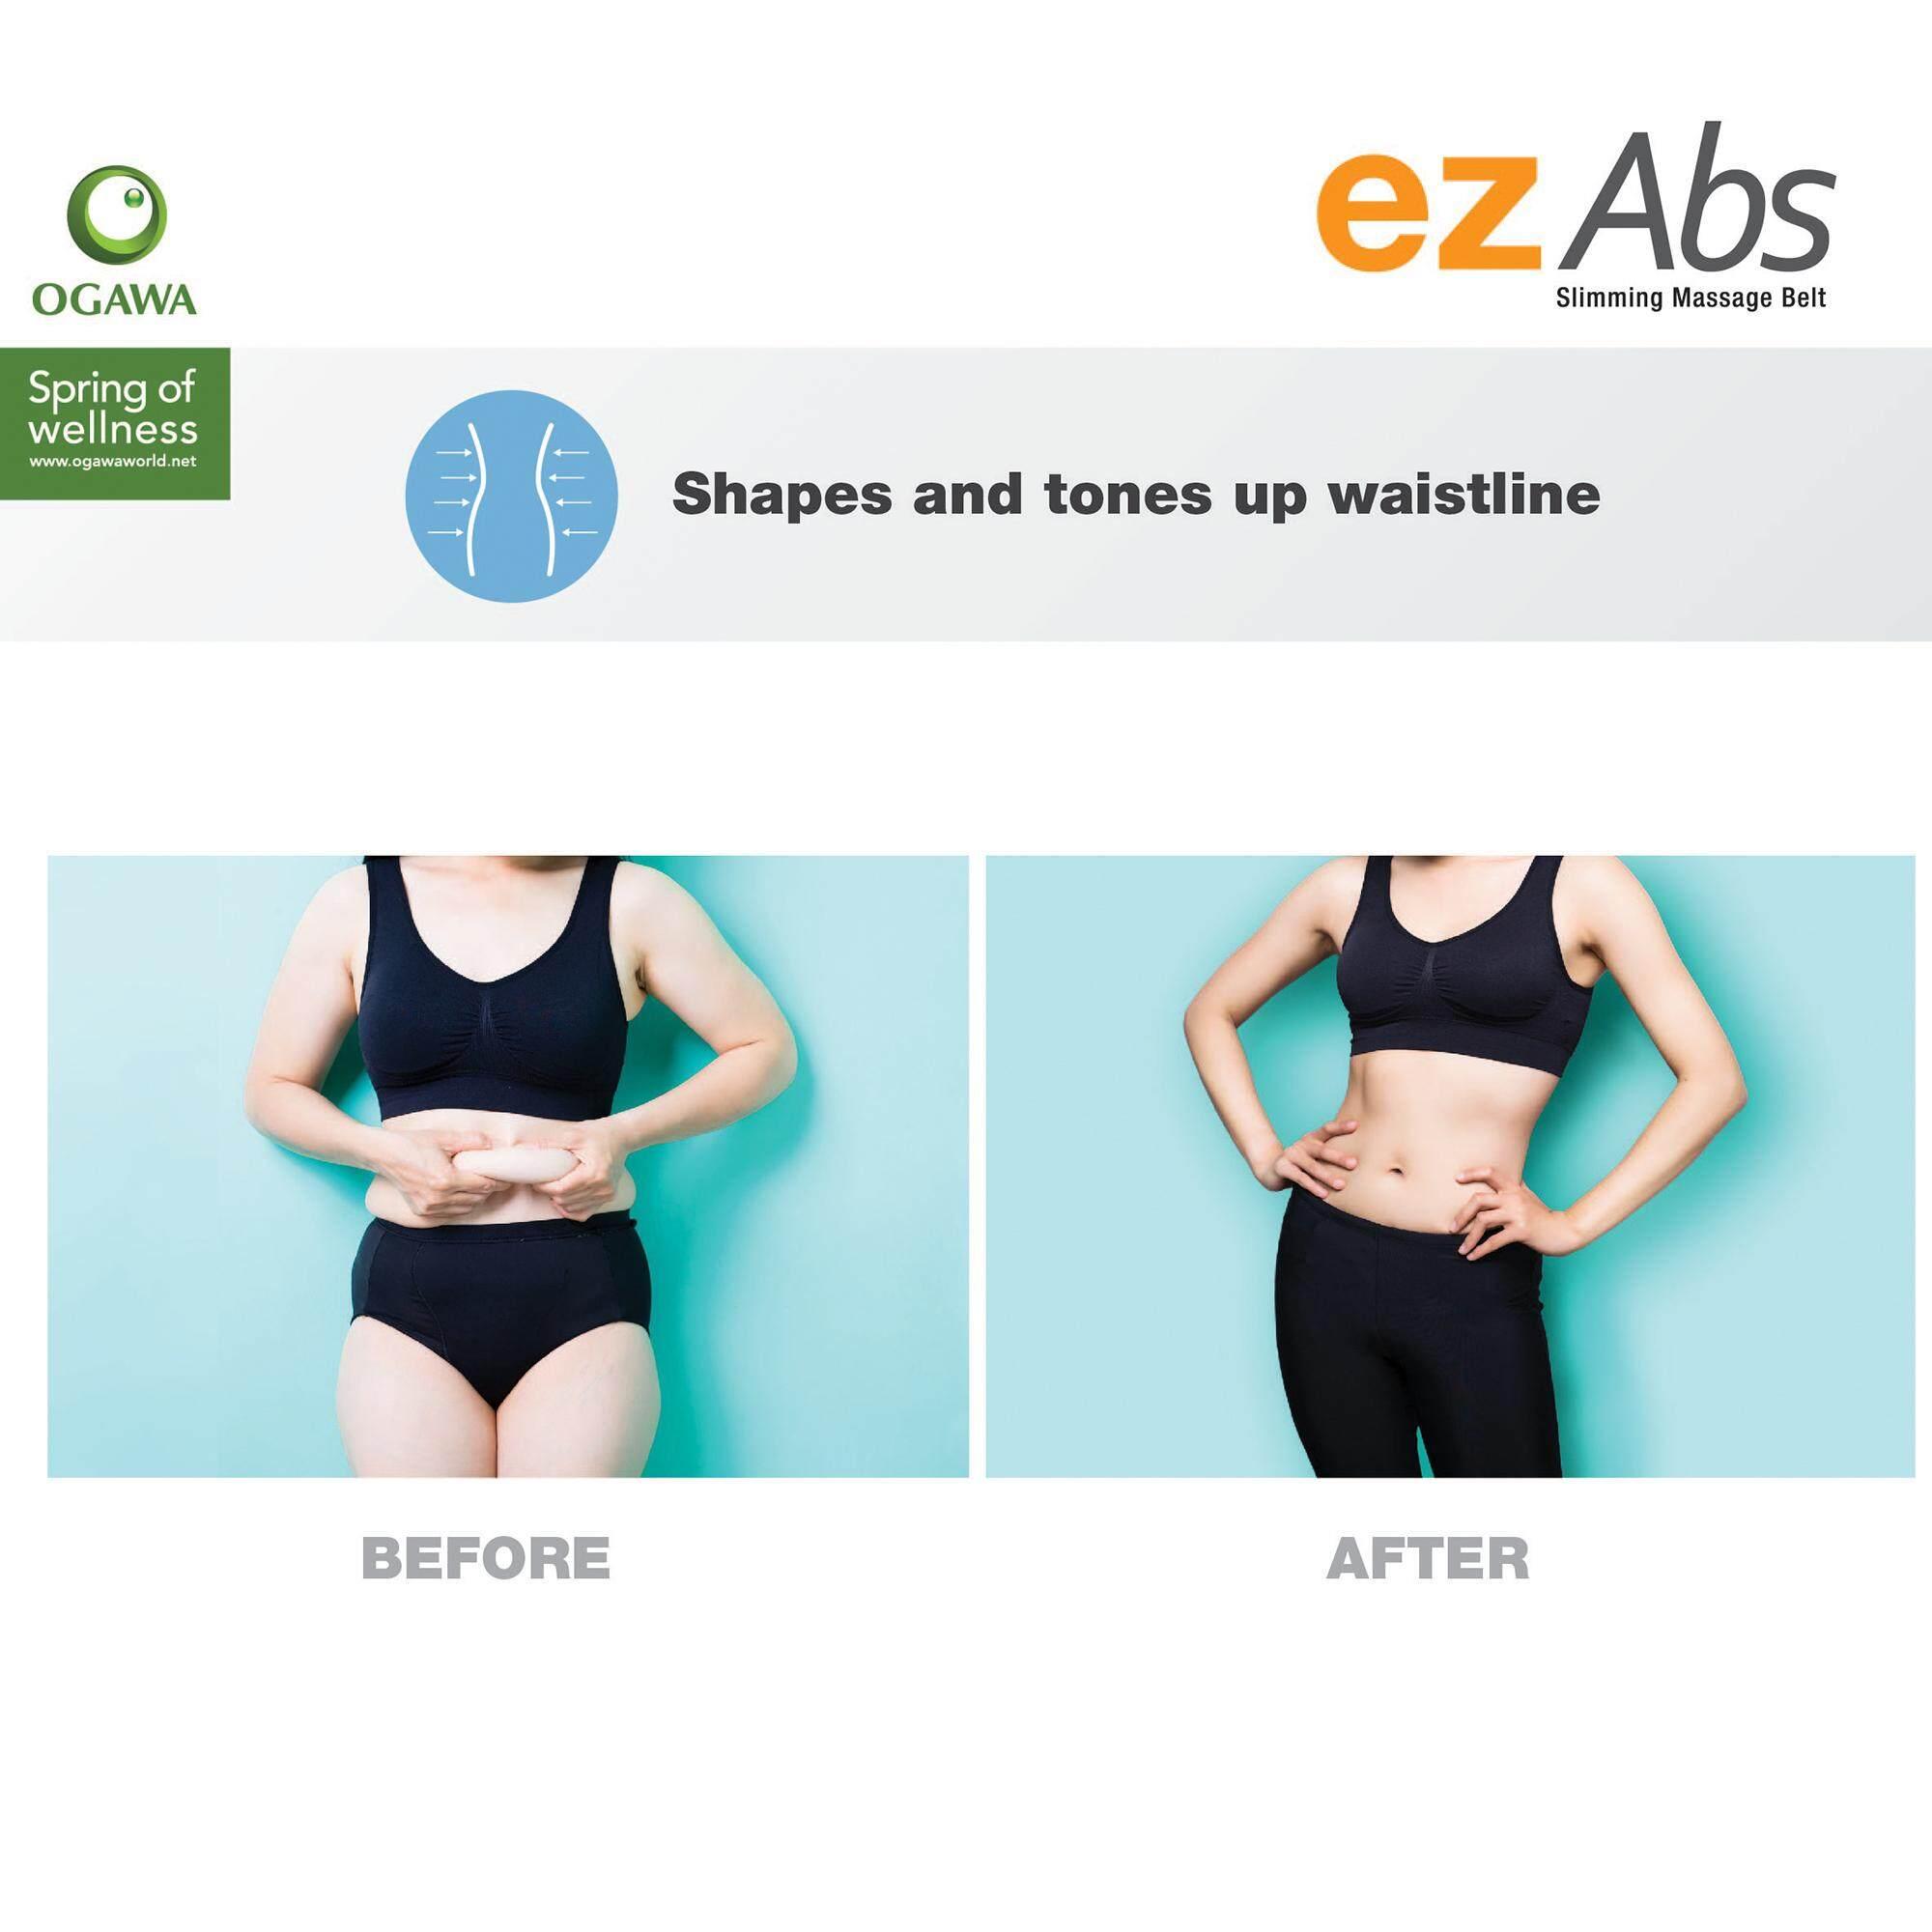 OGAWA Ez Abs Massage Slimming Belt